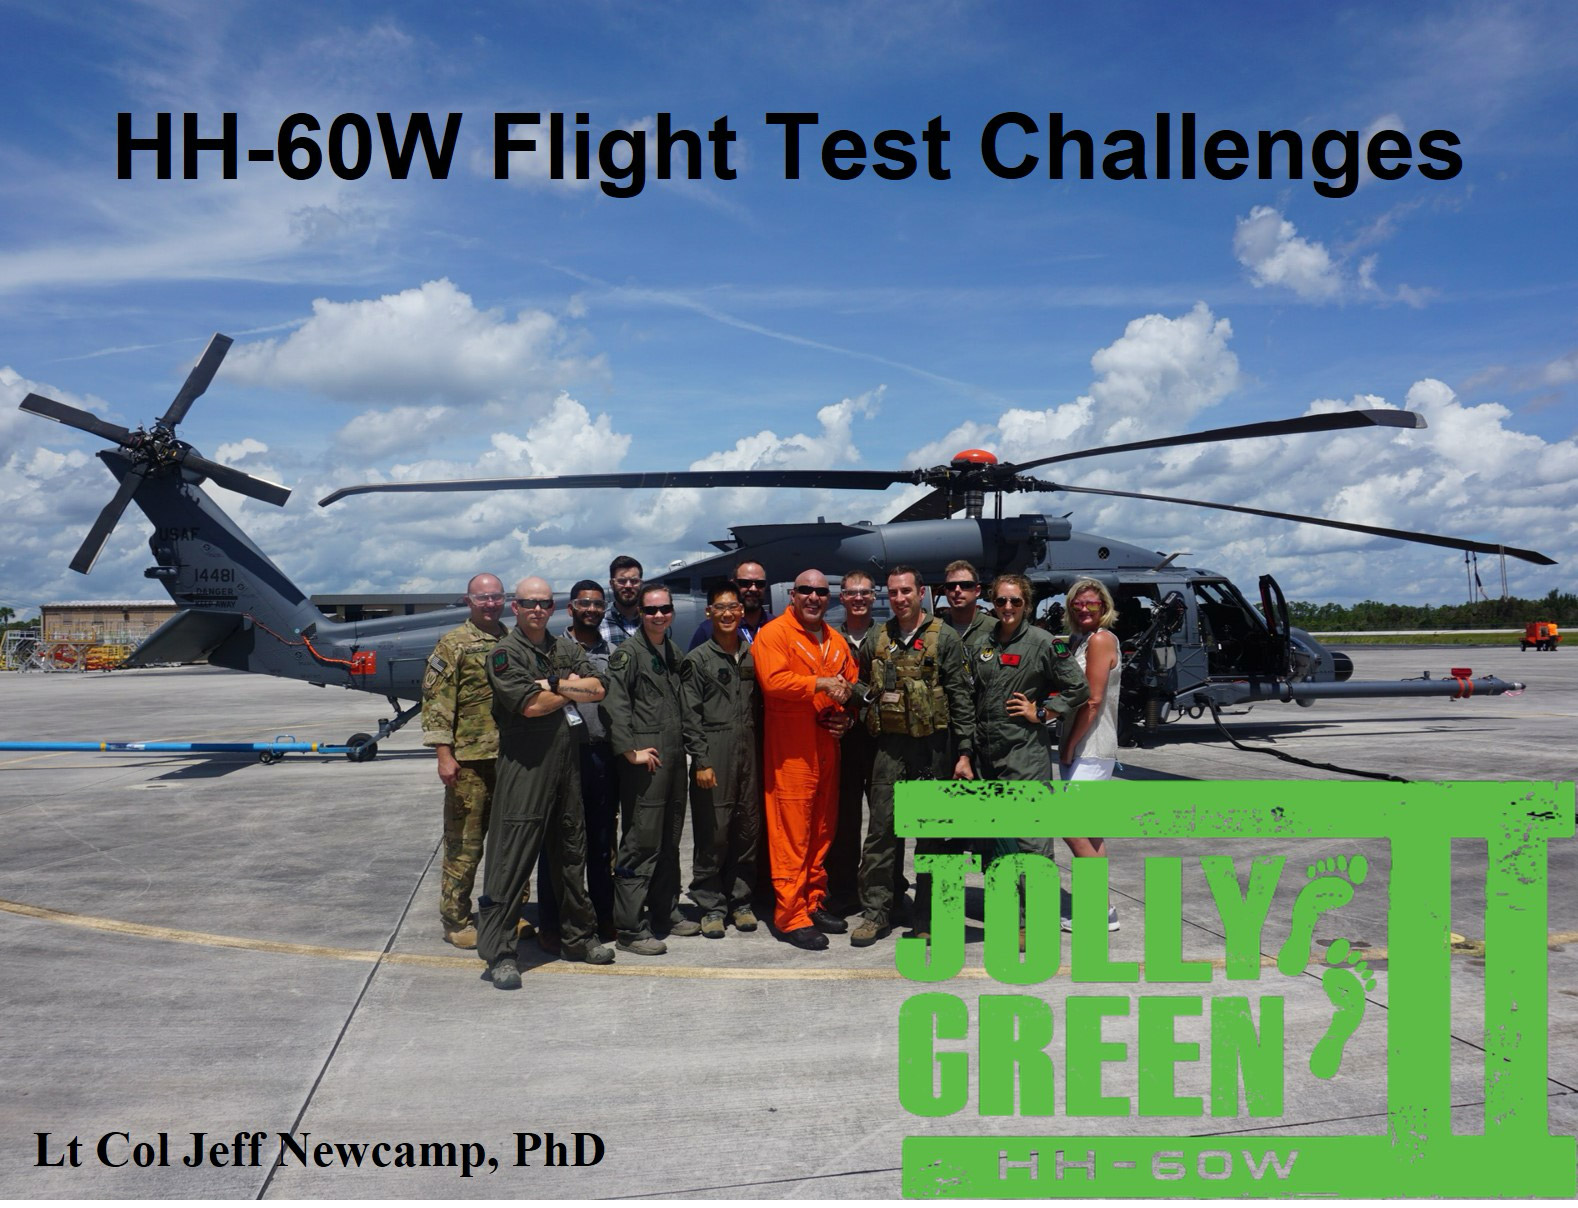 AIAA Atlanta – June 30th Speaker: Lt Col Jeff Newcamp